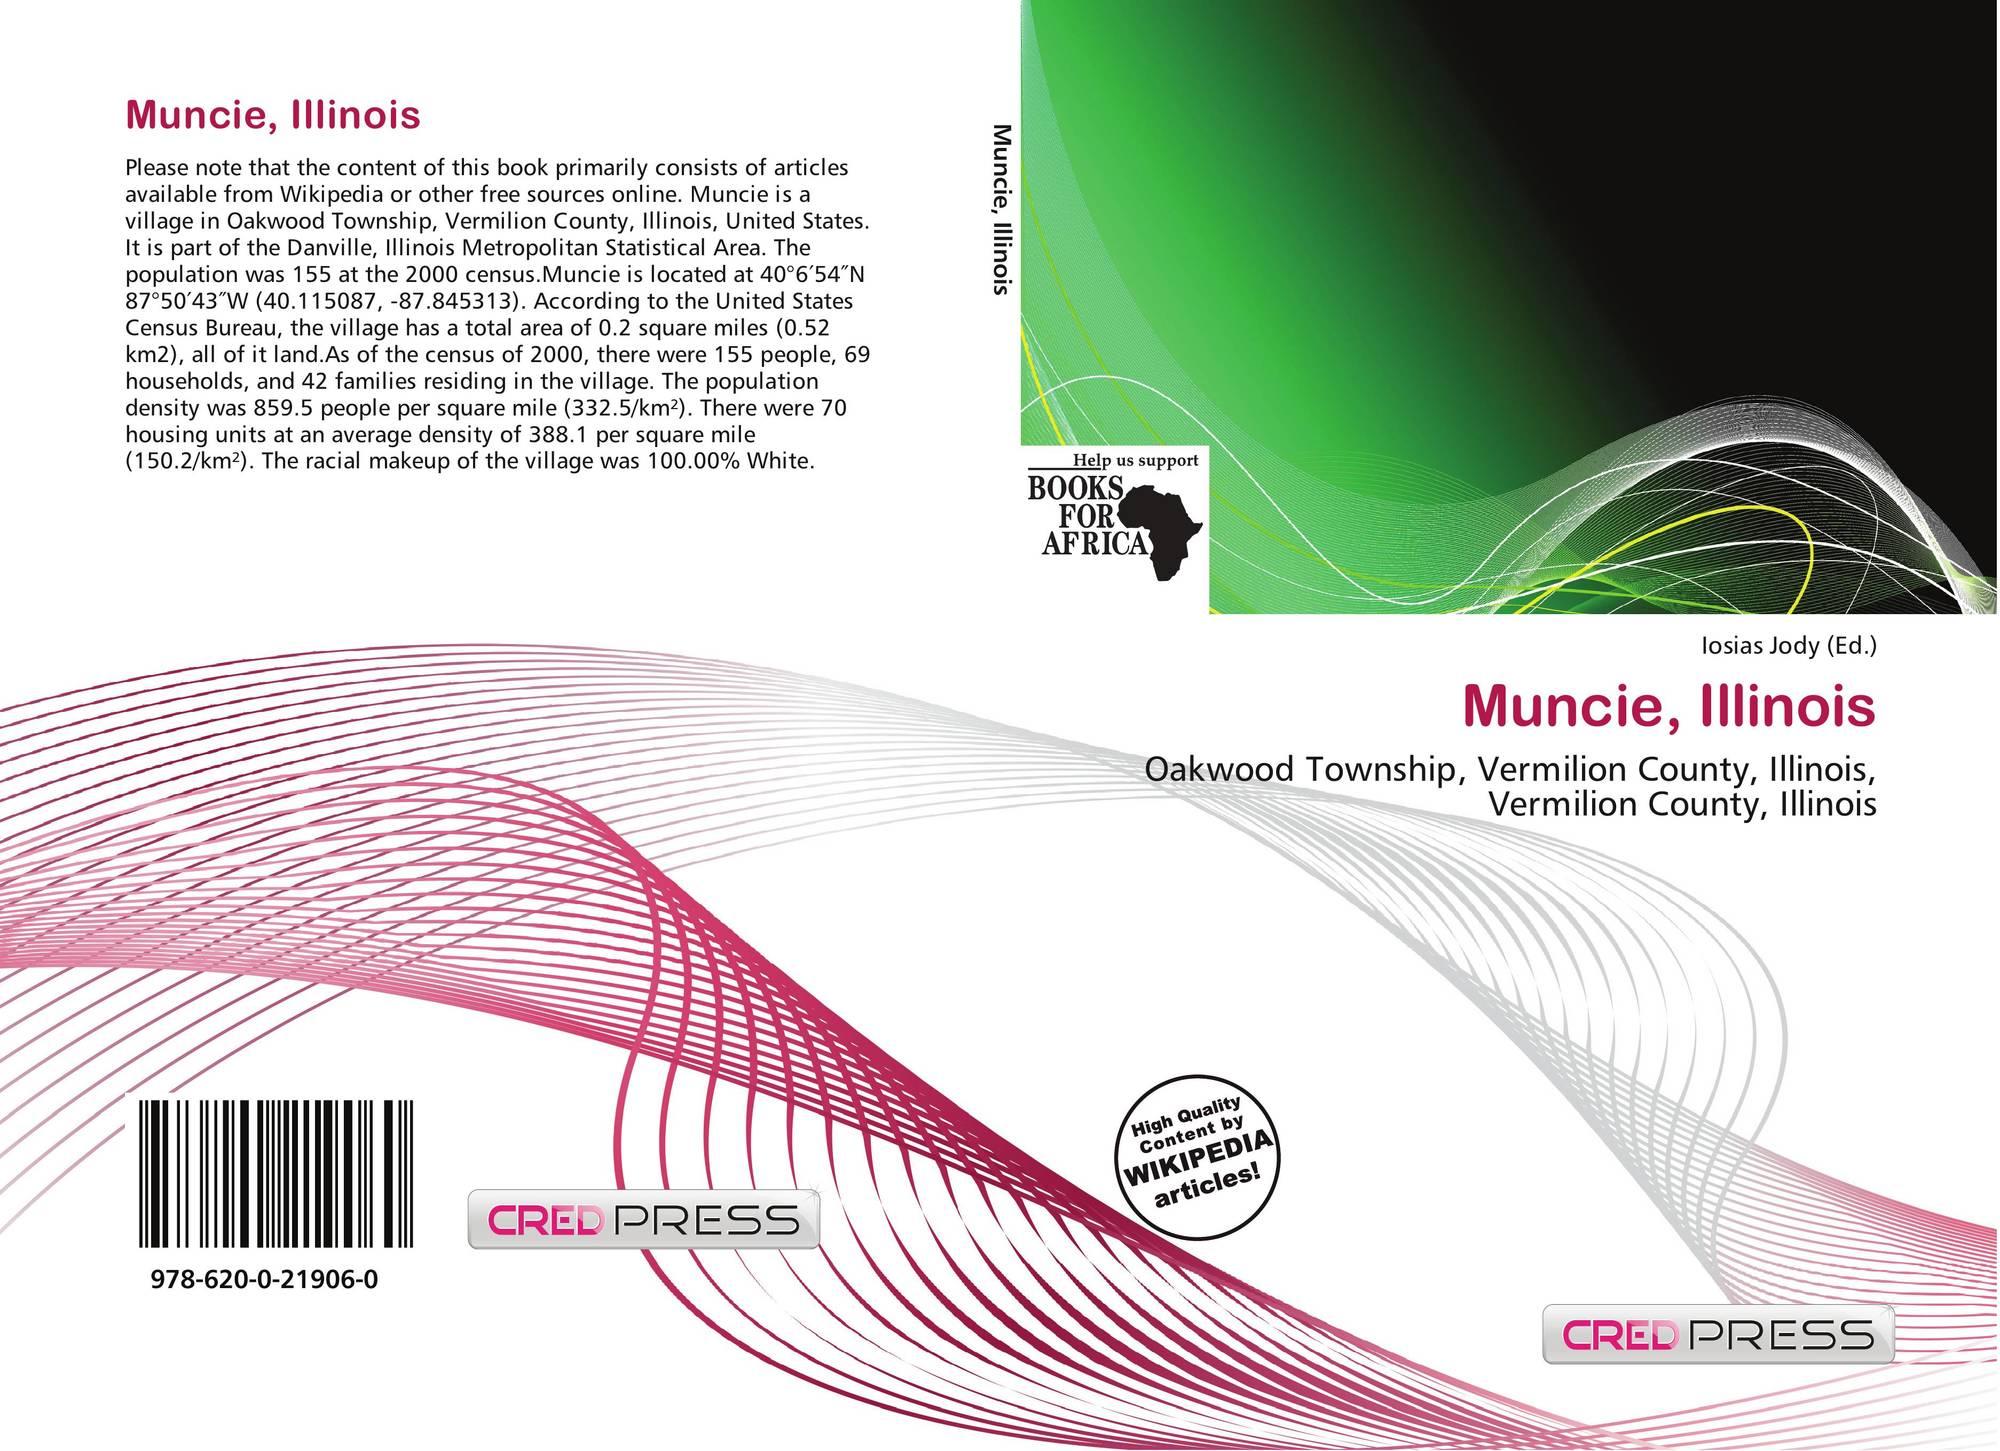 Illinois vermilion county muncie - Bookcover Of Muncie Illinois